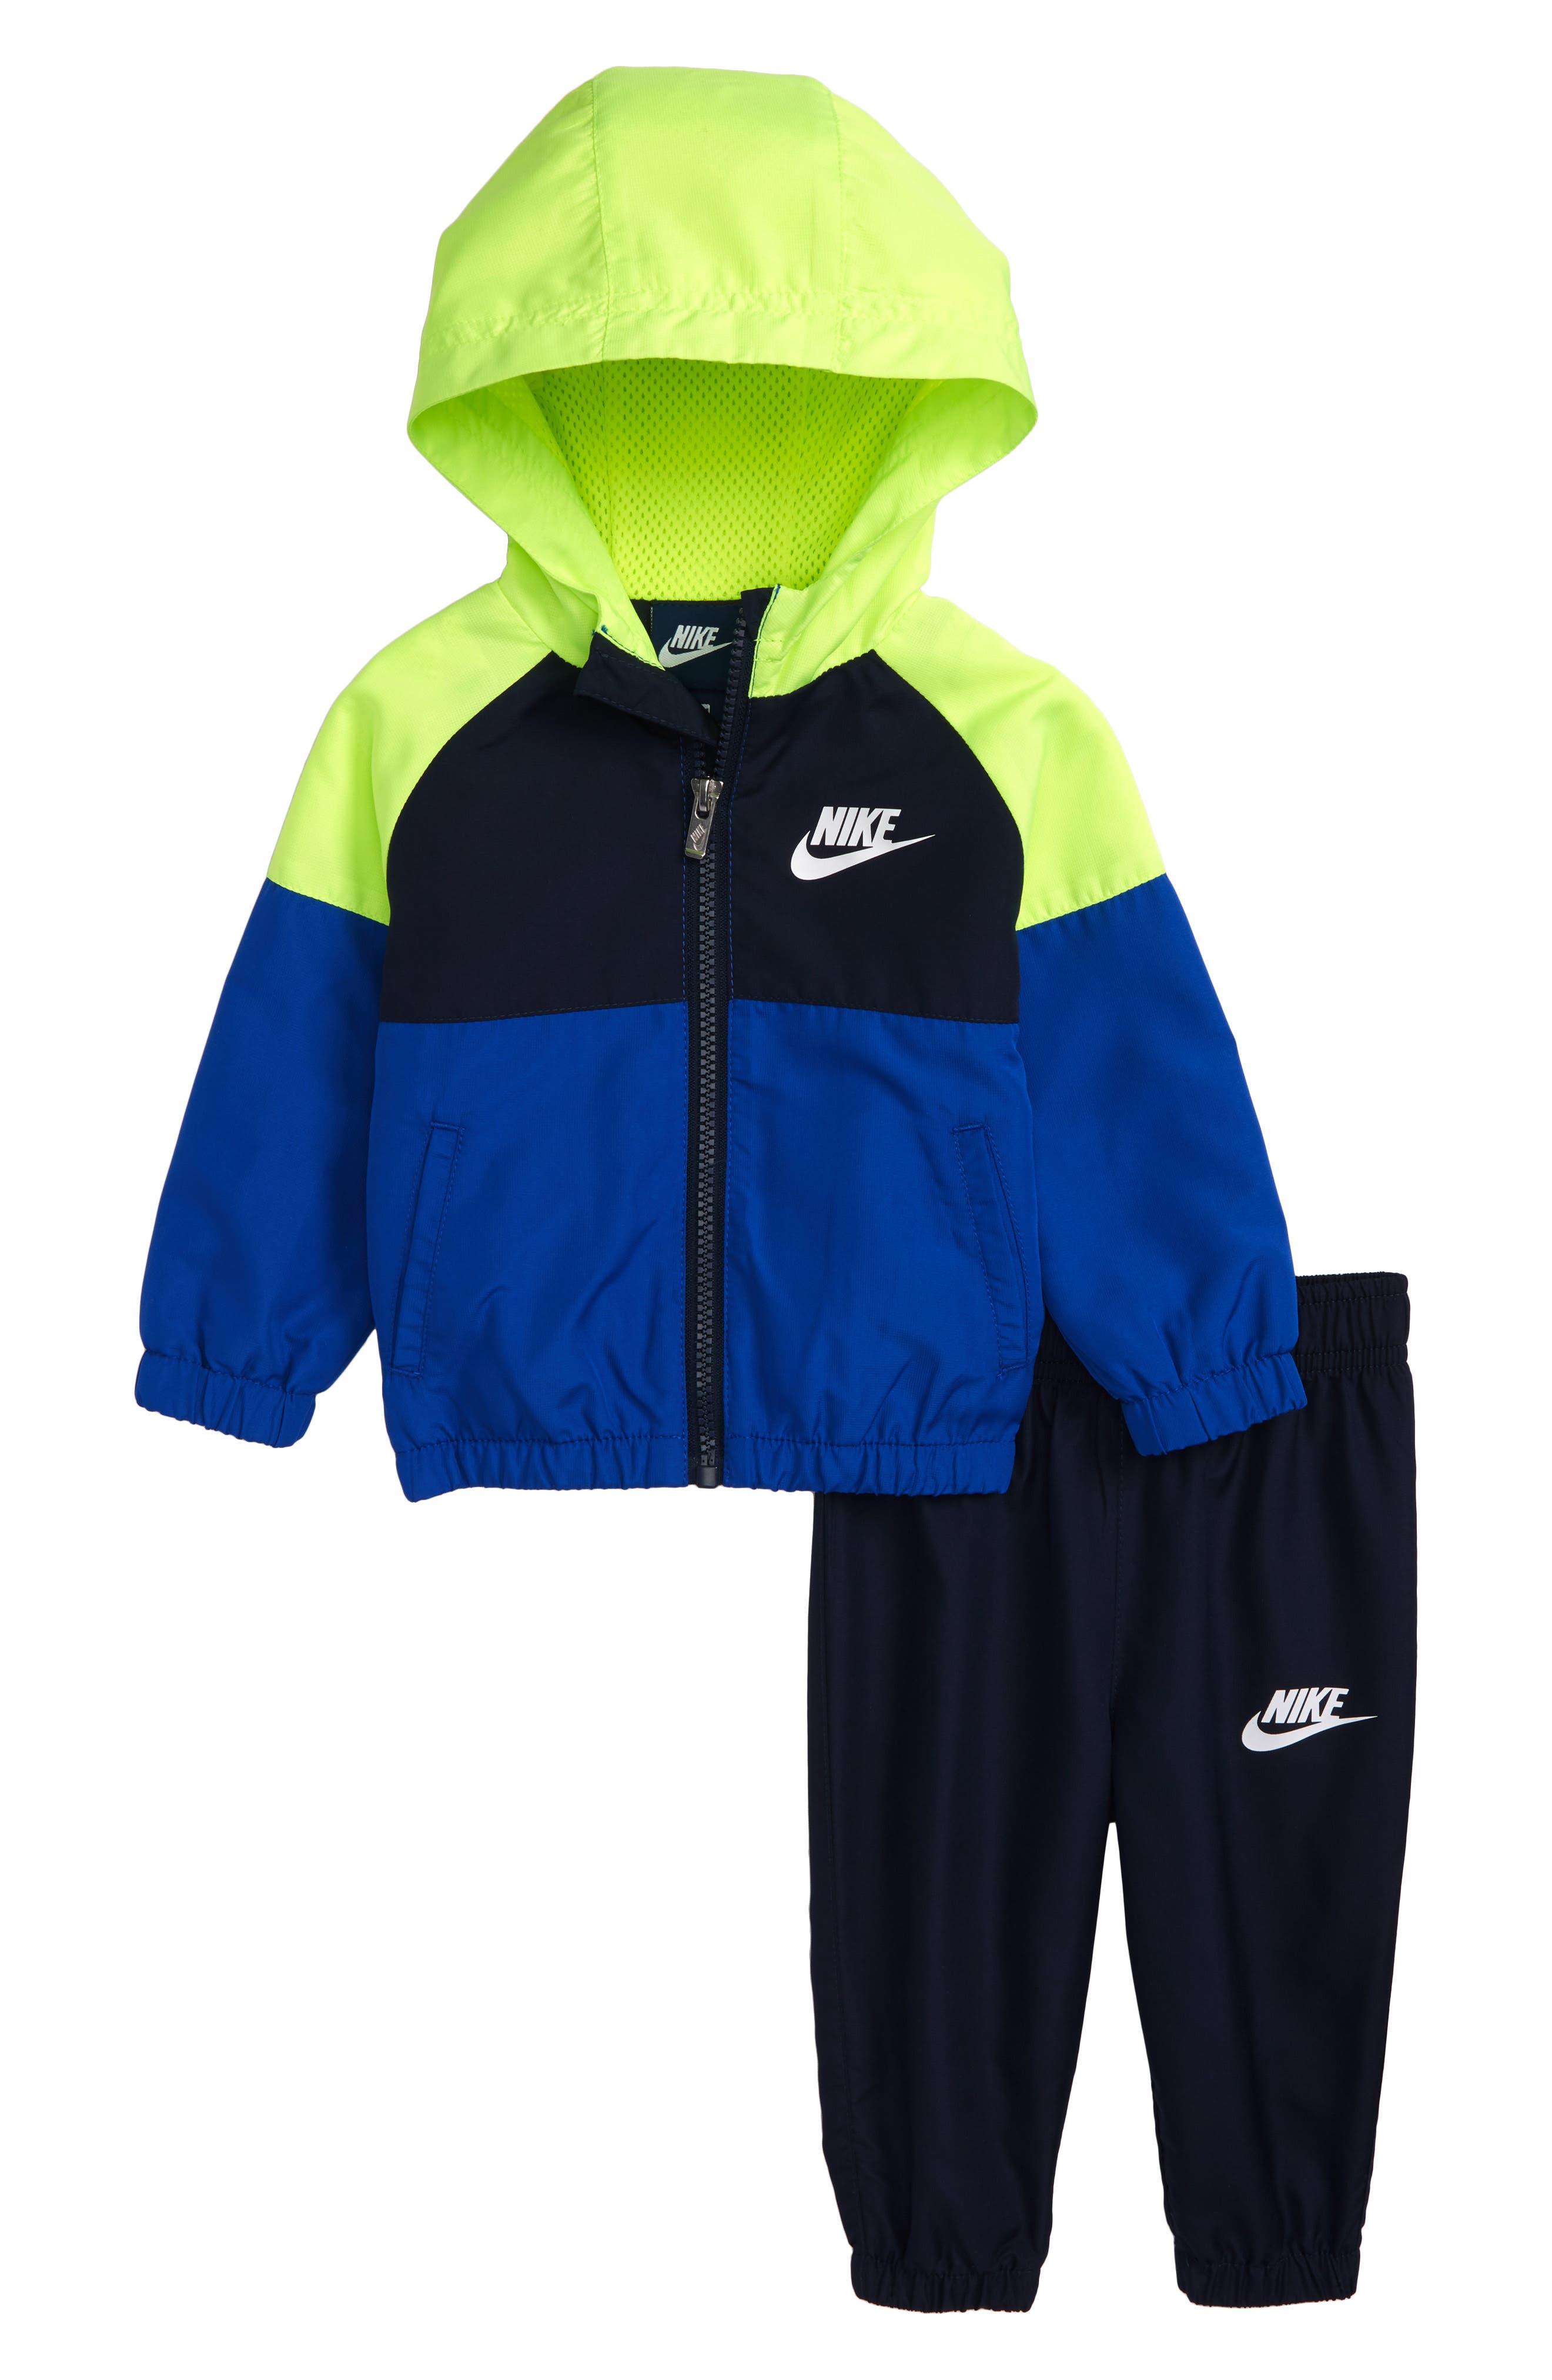 Boys Nike Sweatshirts On Sale - Cladem